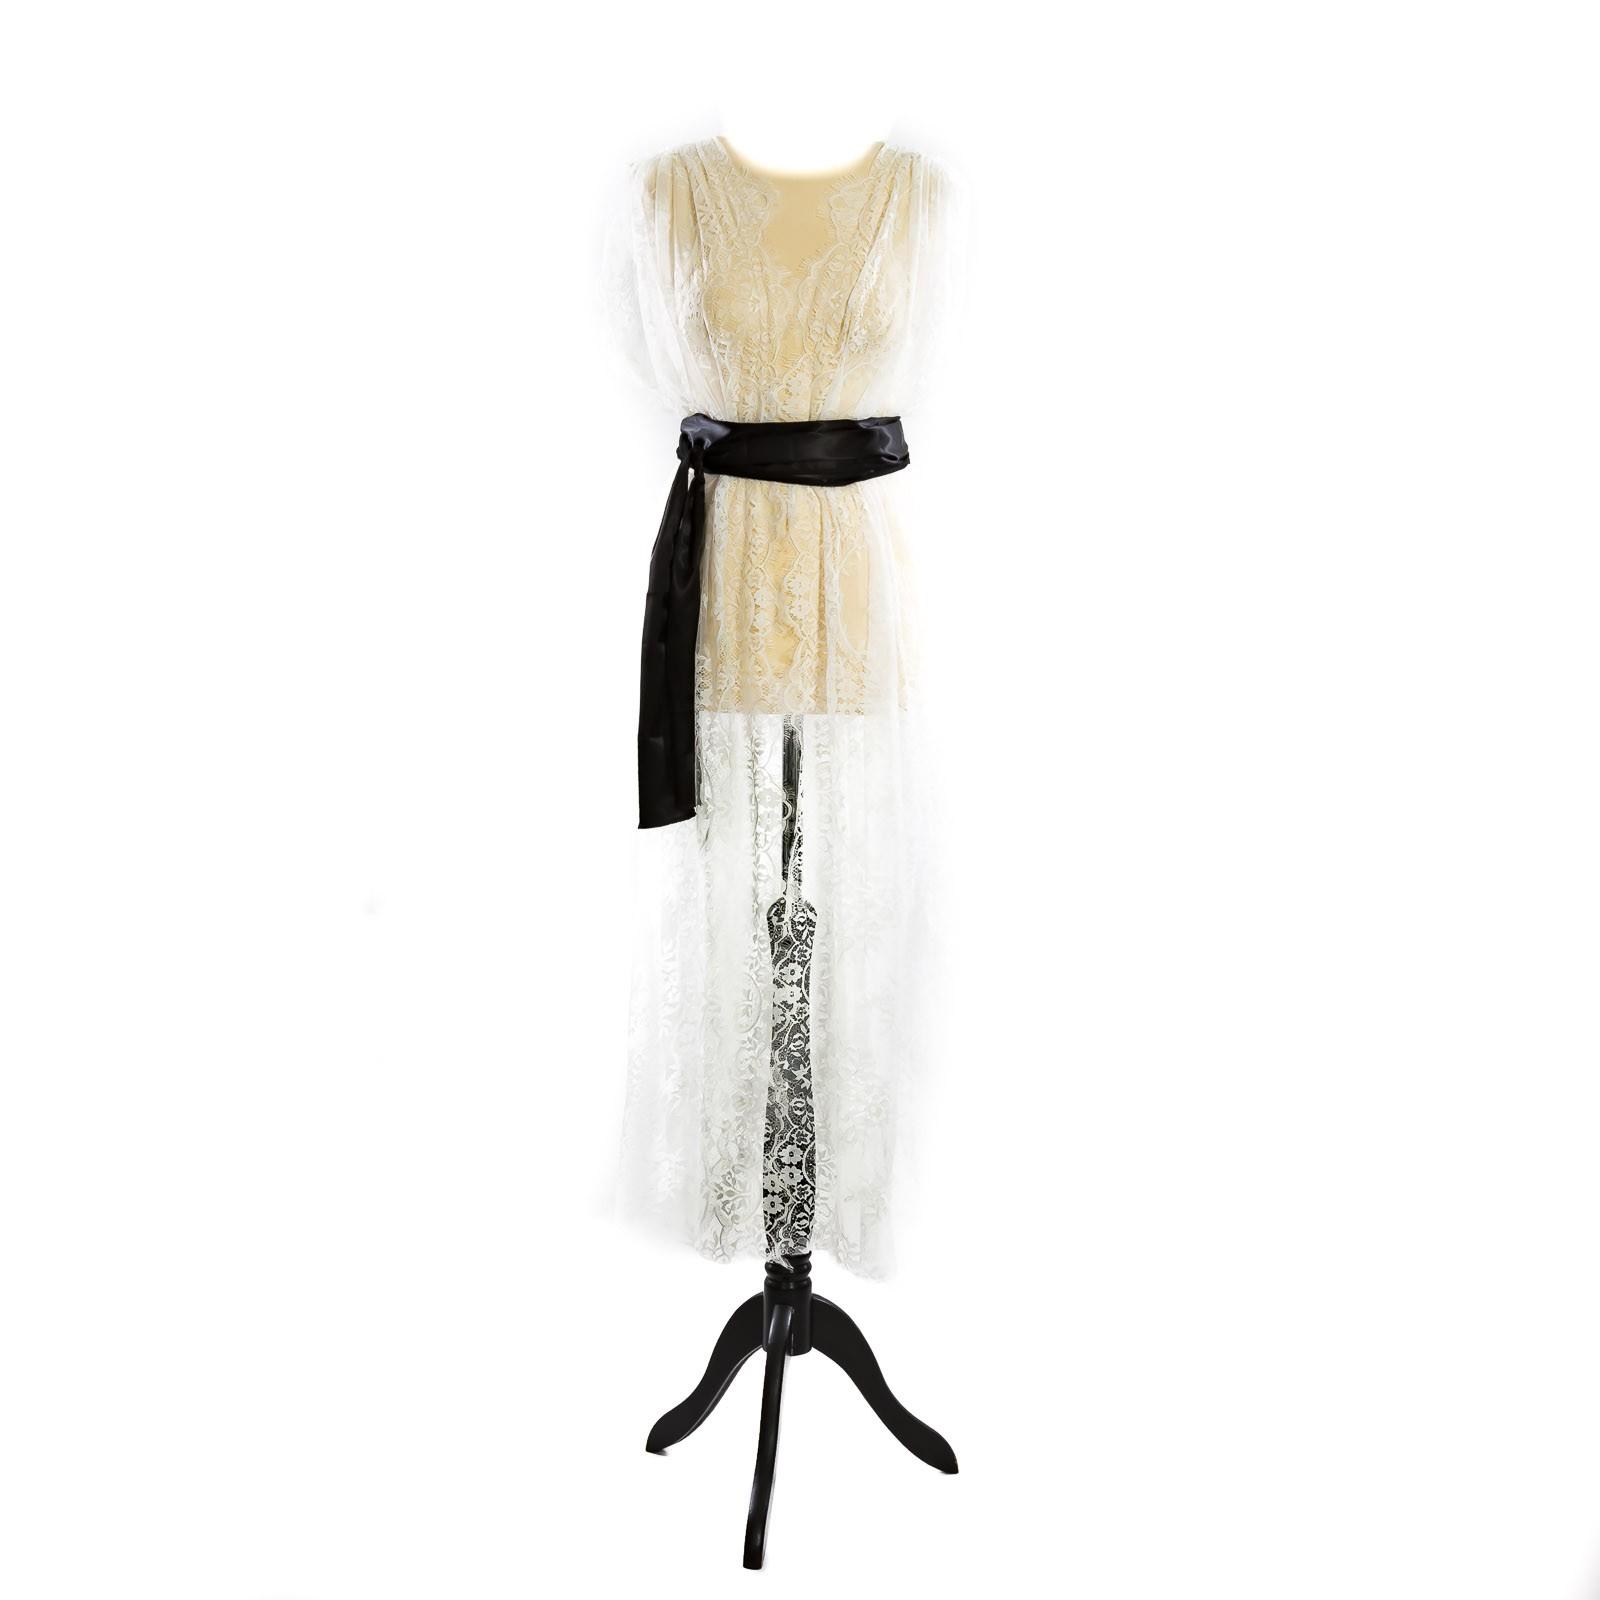 sialinda: kleid lydia sonderedition spitze, weiß, ouvert, lang, inkl.  schwarzen gürtel.